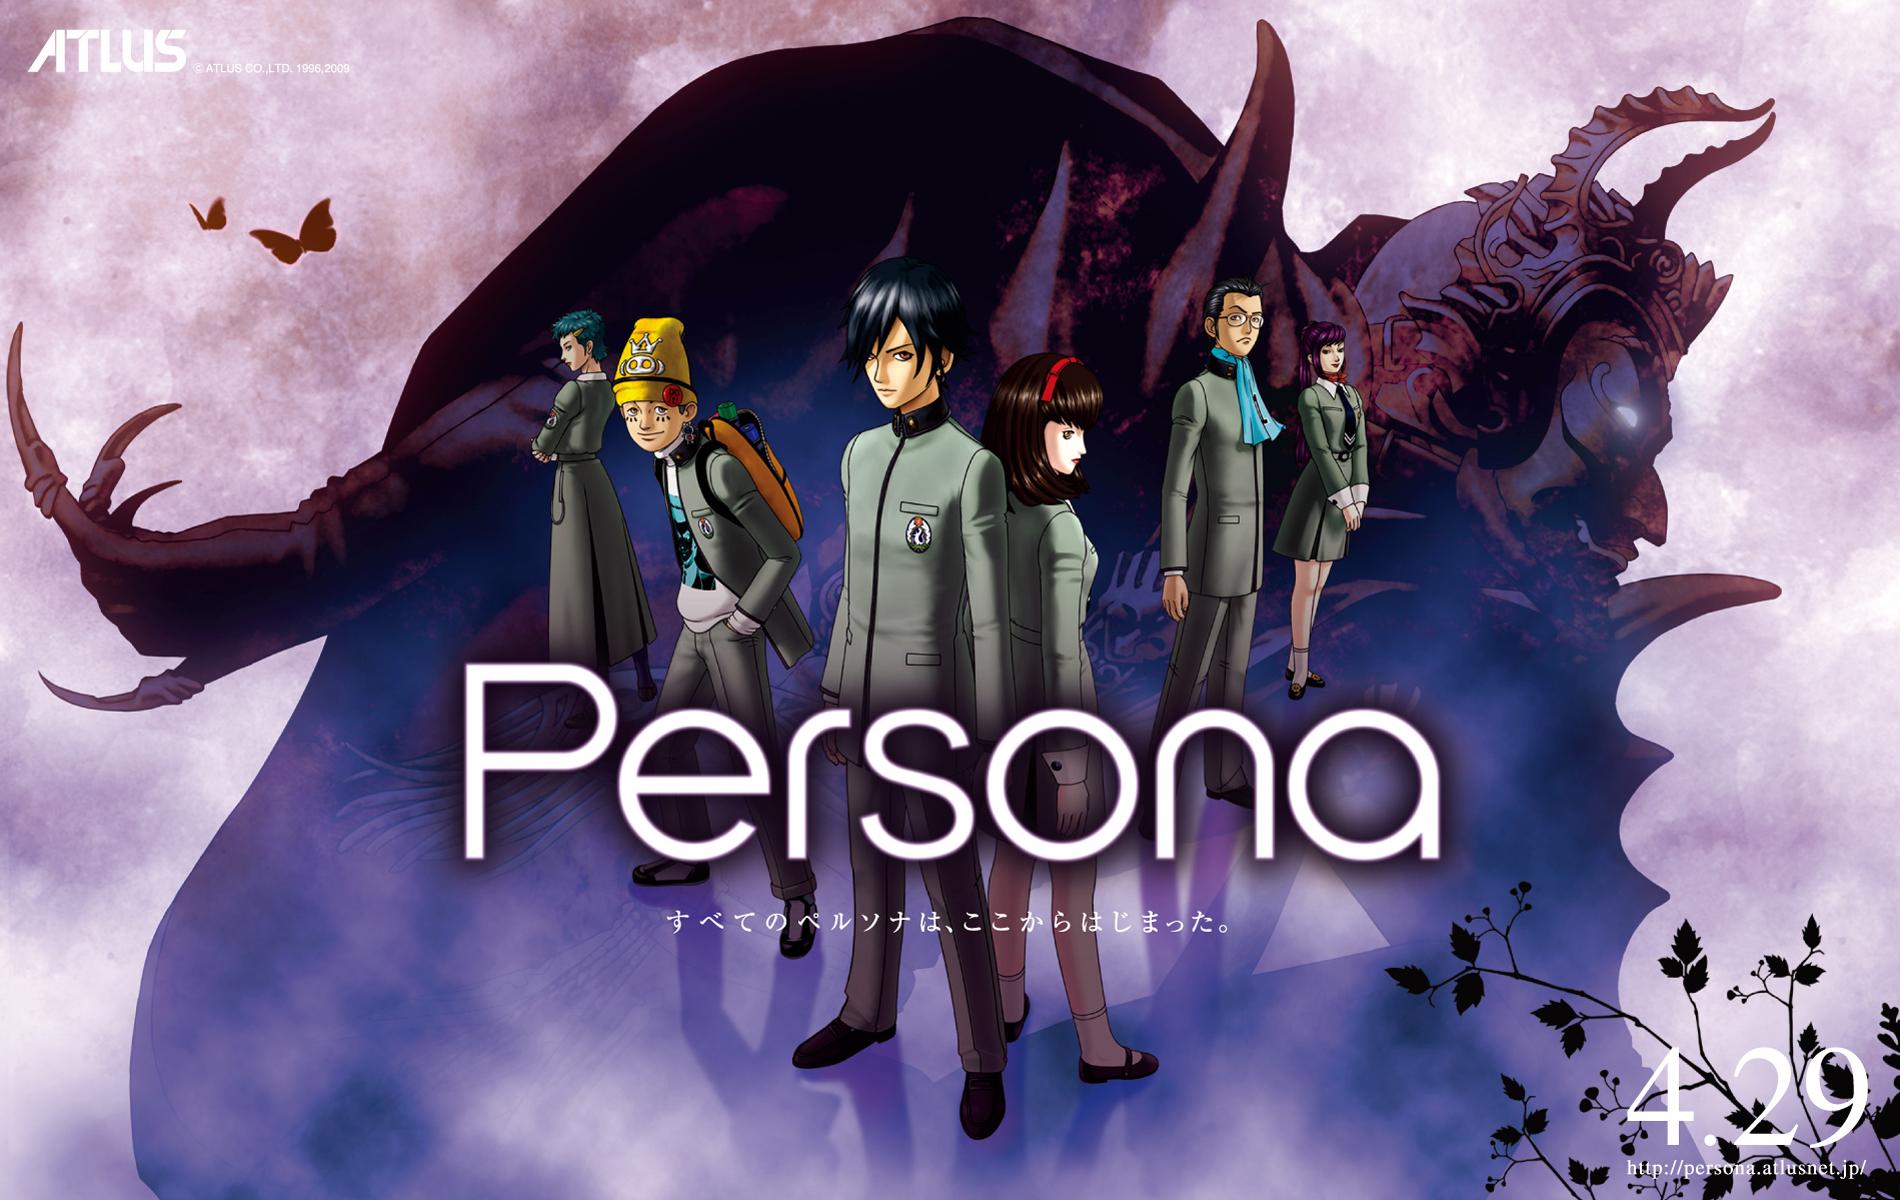 Cool Video Game Wallpapers Hd Shin Megami Tensei Persona Wallpaper